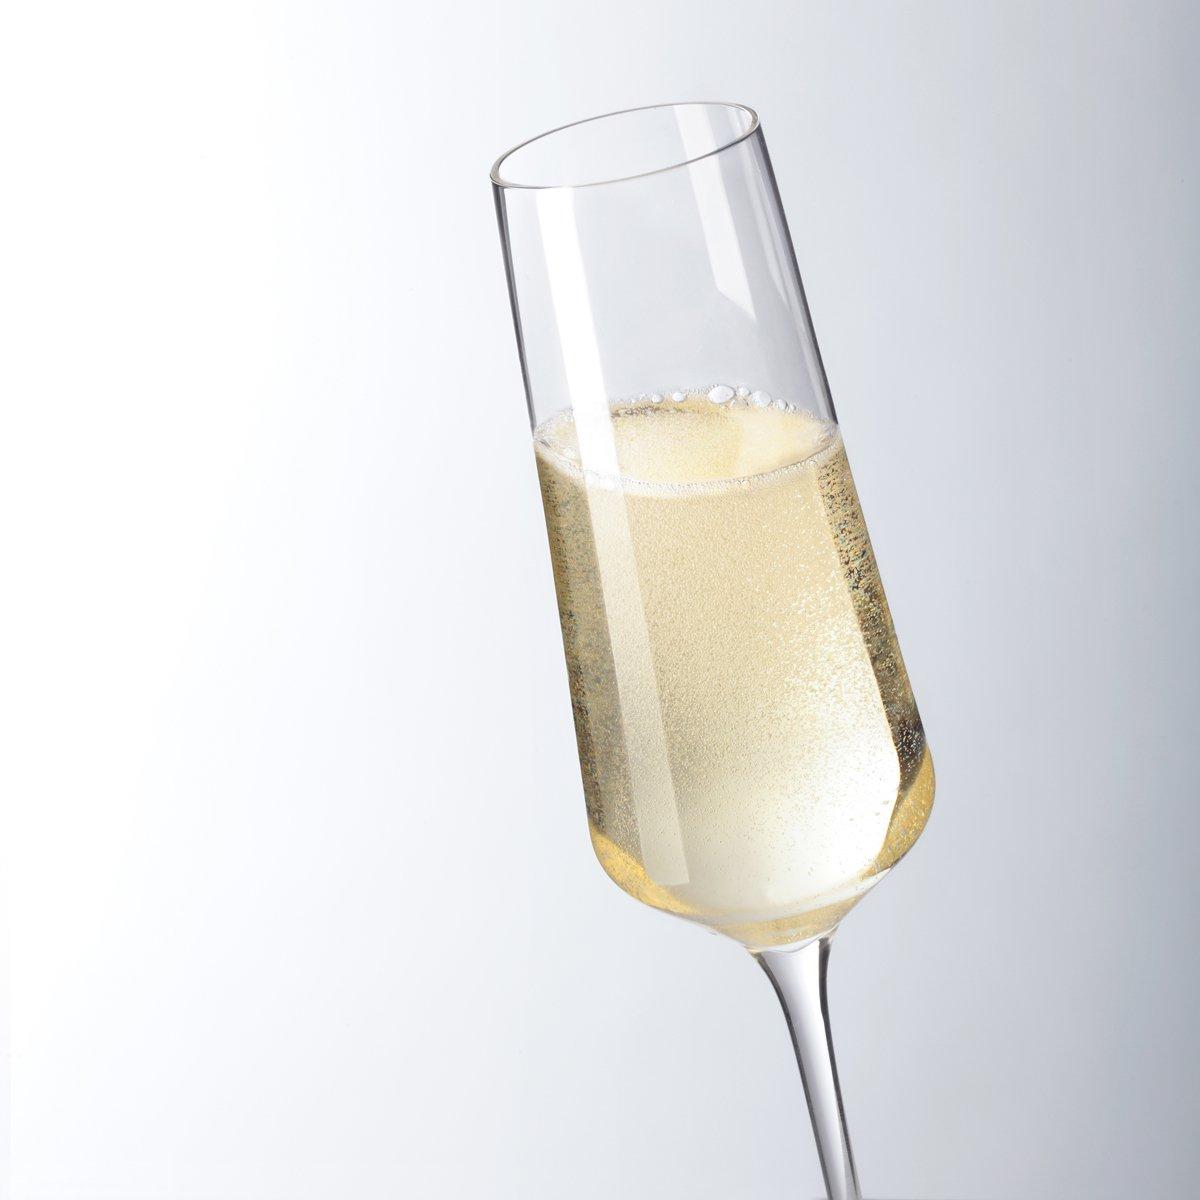 61DZvx3bZ9L. SL1200  - Pahar pentru șampanie Puccini 280 ml (L069550)